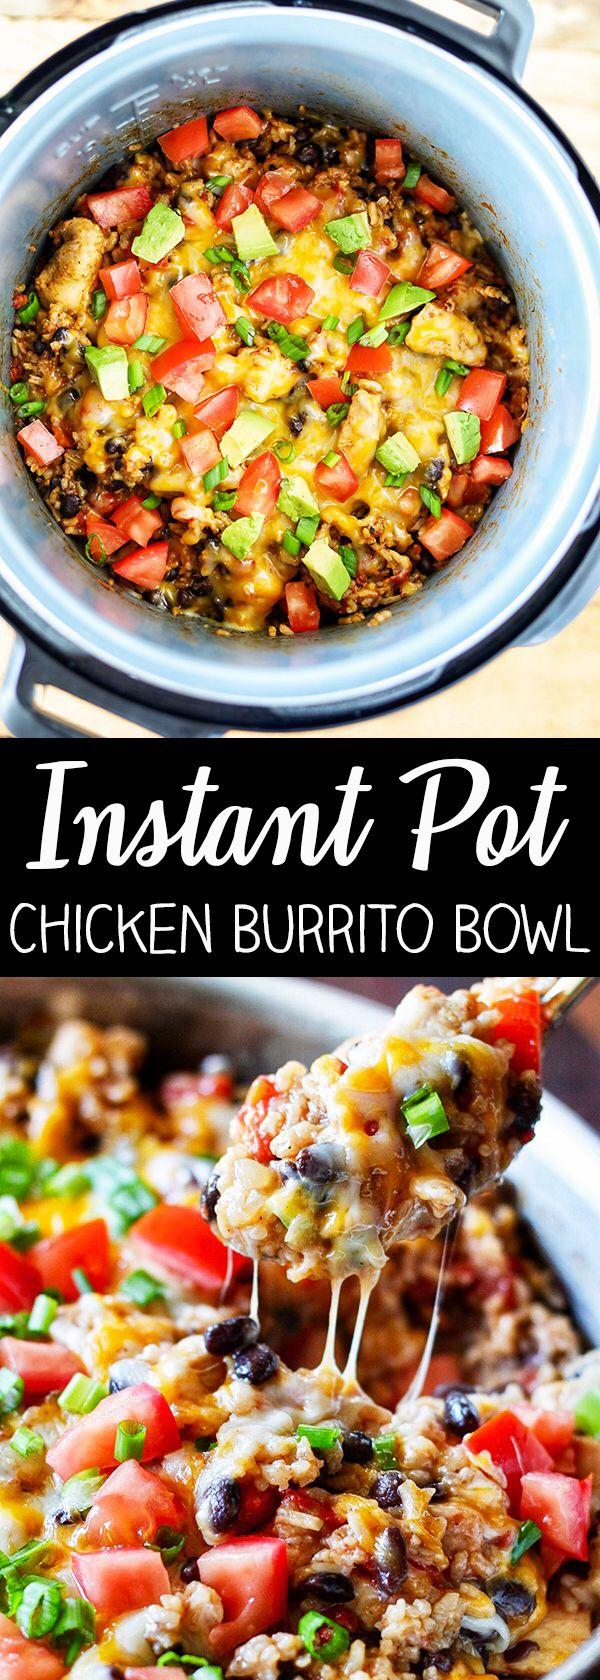 Instant Pot Chicken Burrito Bowl - easy Instant Pot dinner idea!